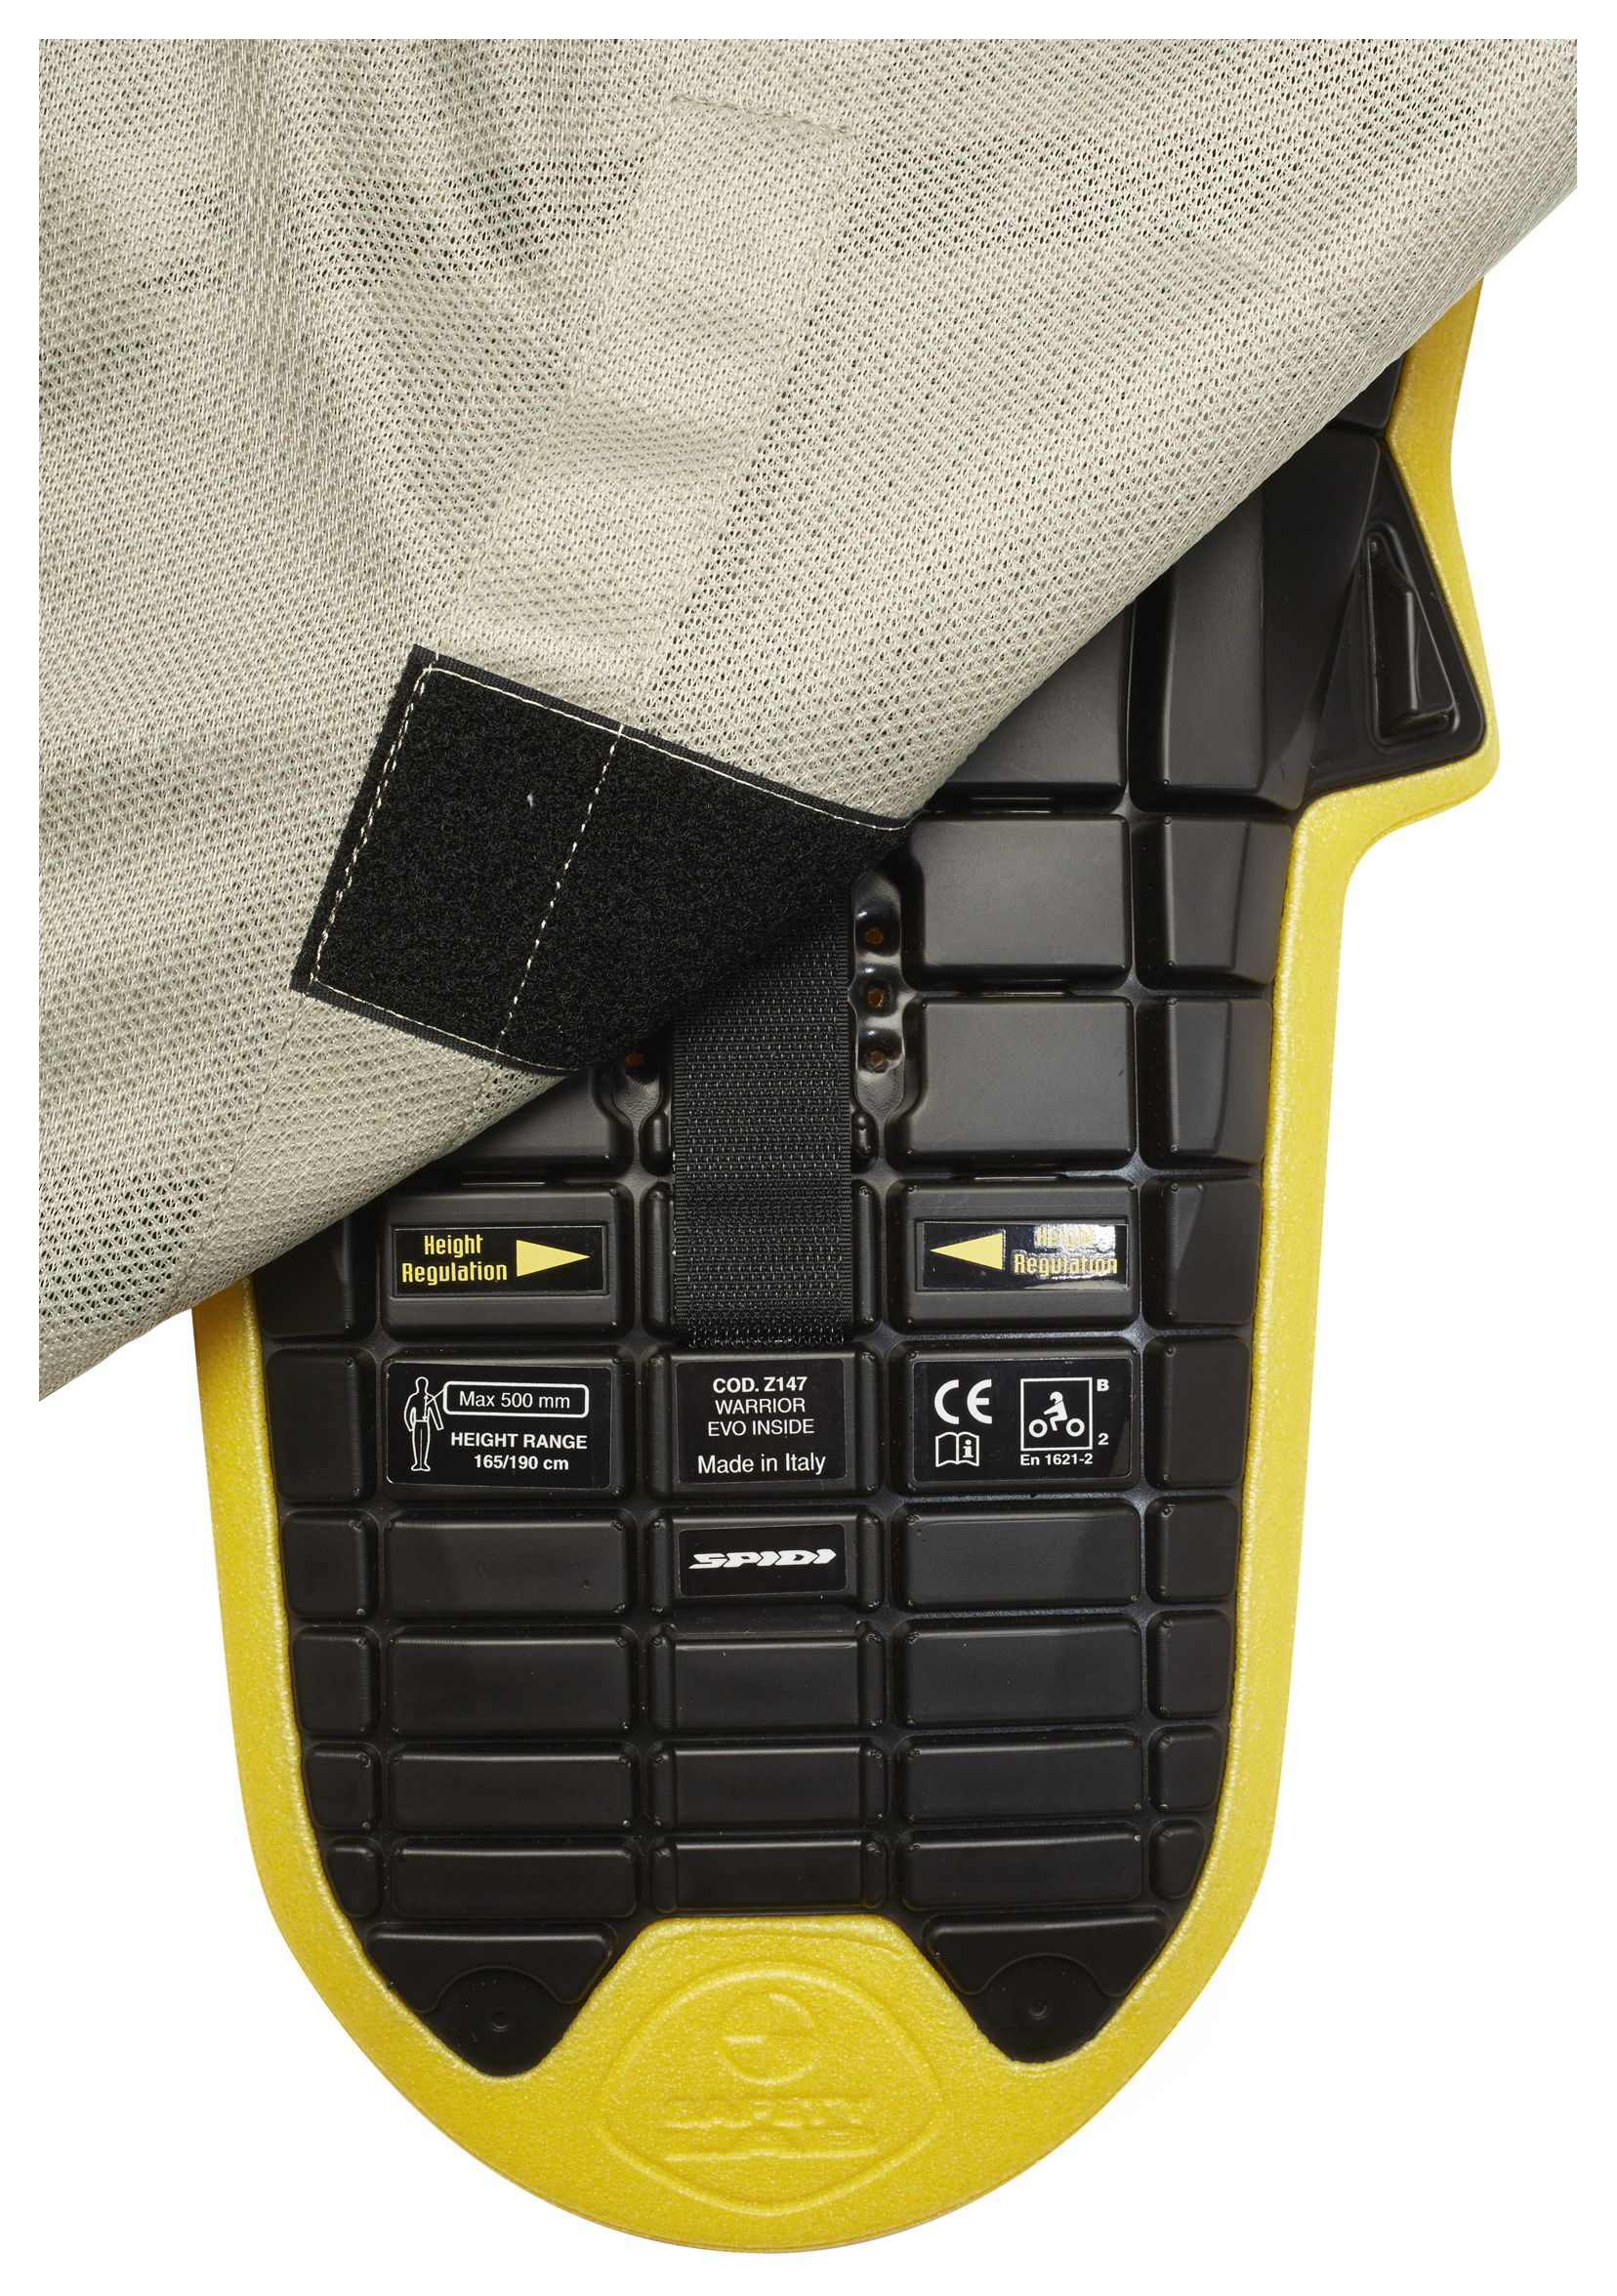 Spidi Airtech Armor Jacket Revzilla Kz1000 Routing Wiring Diagram